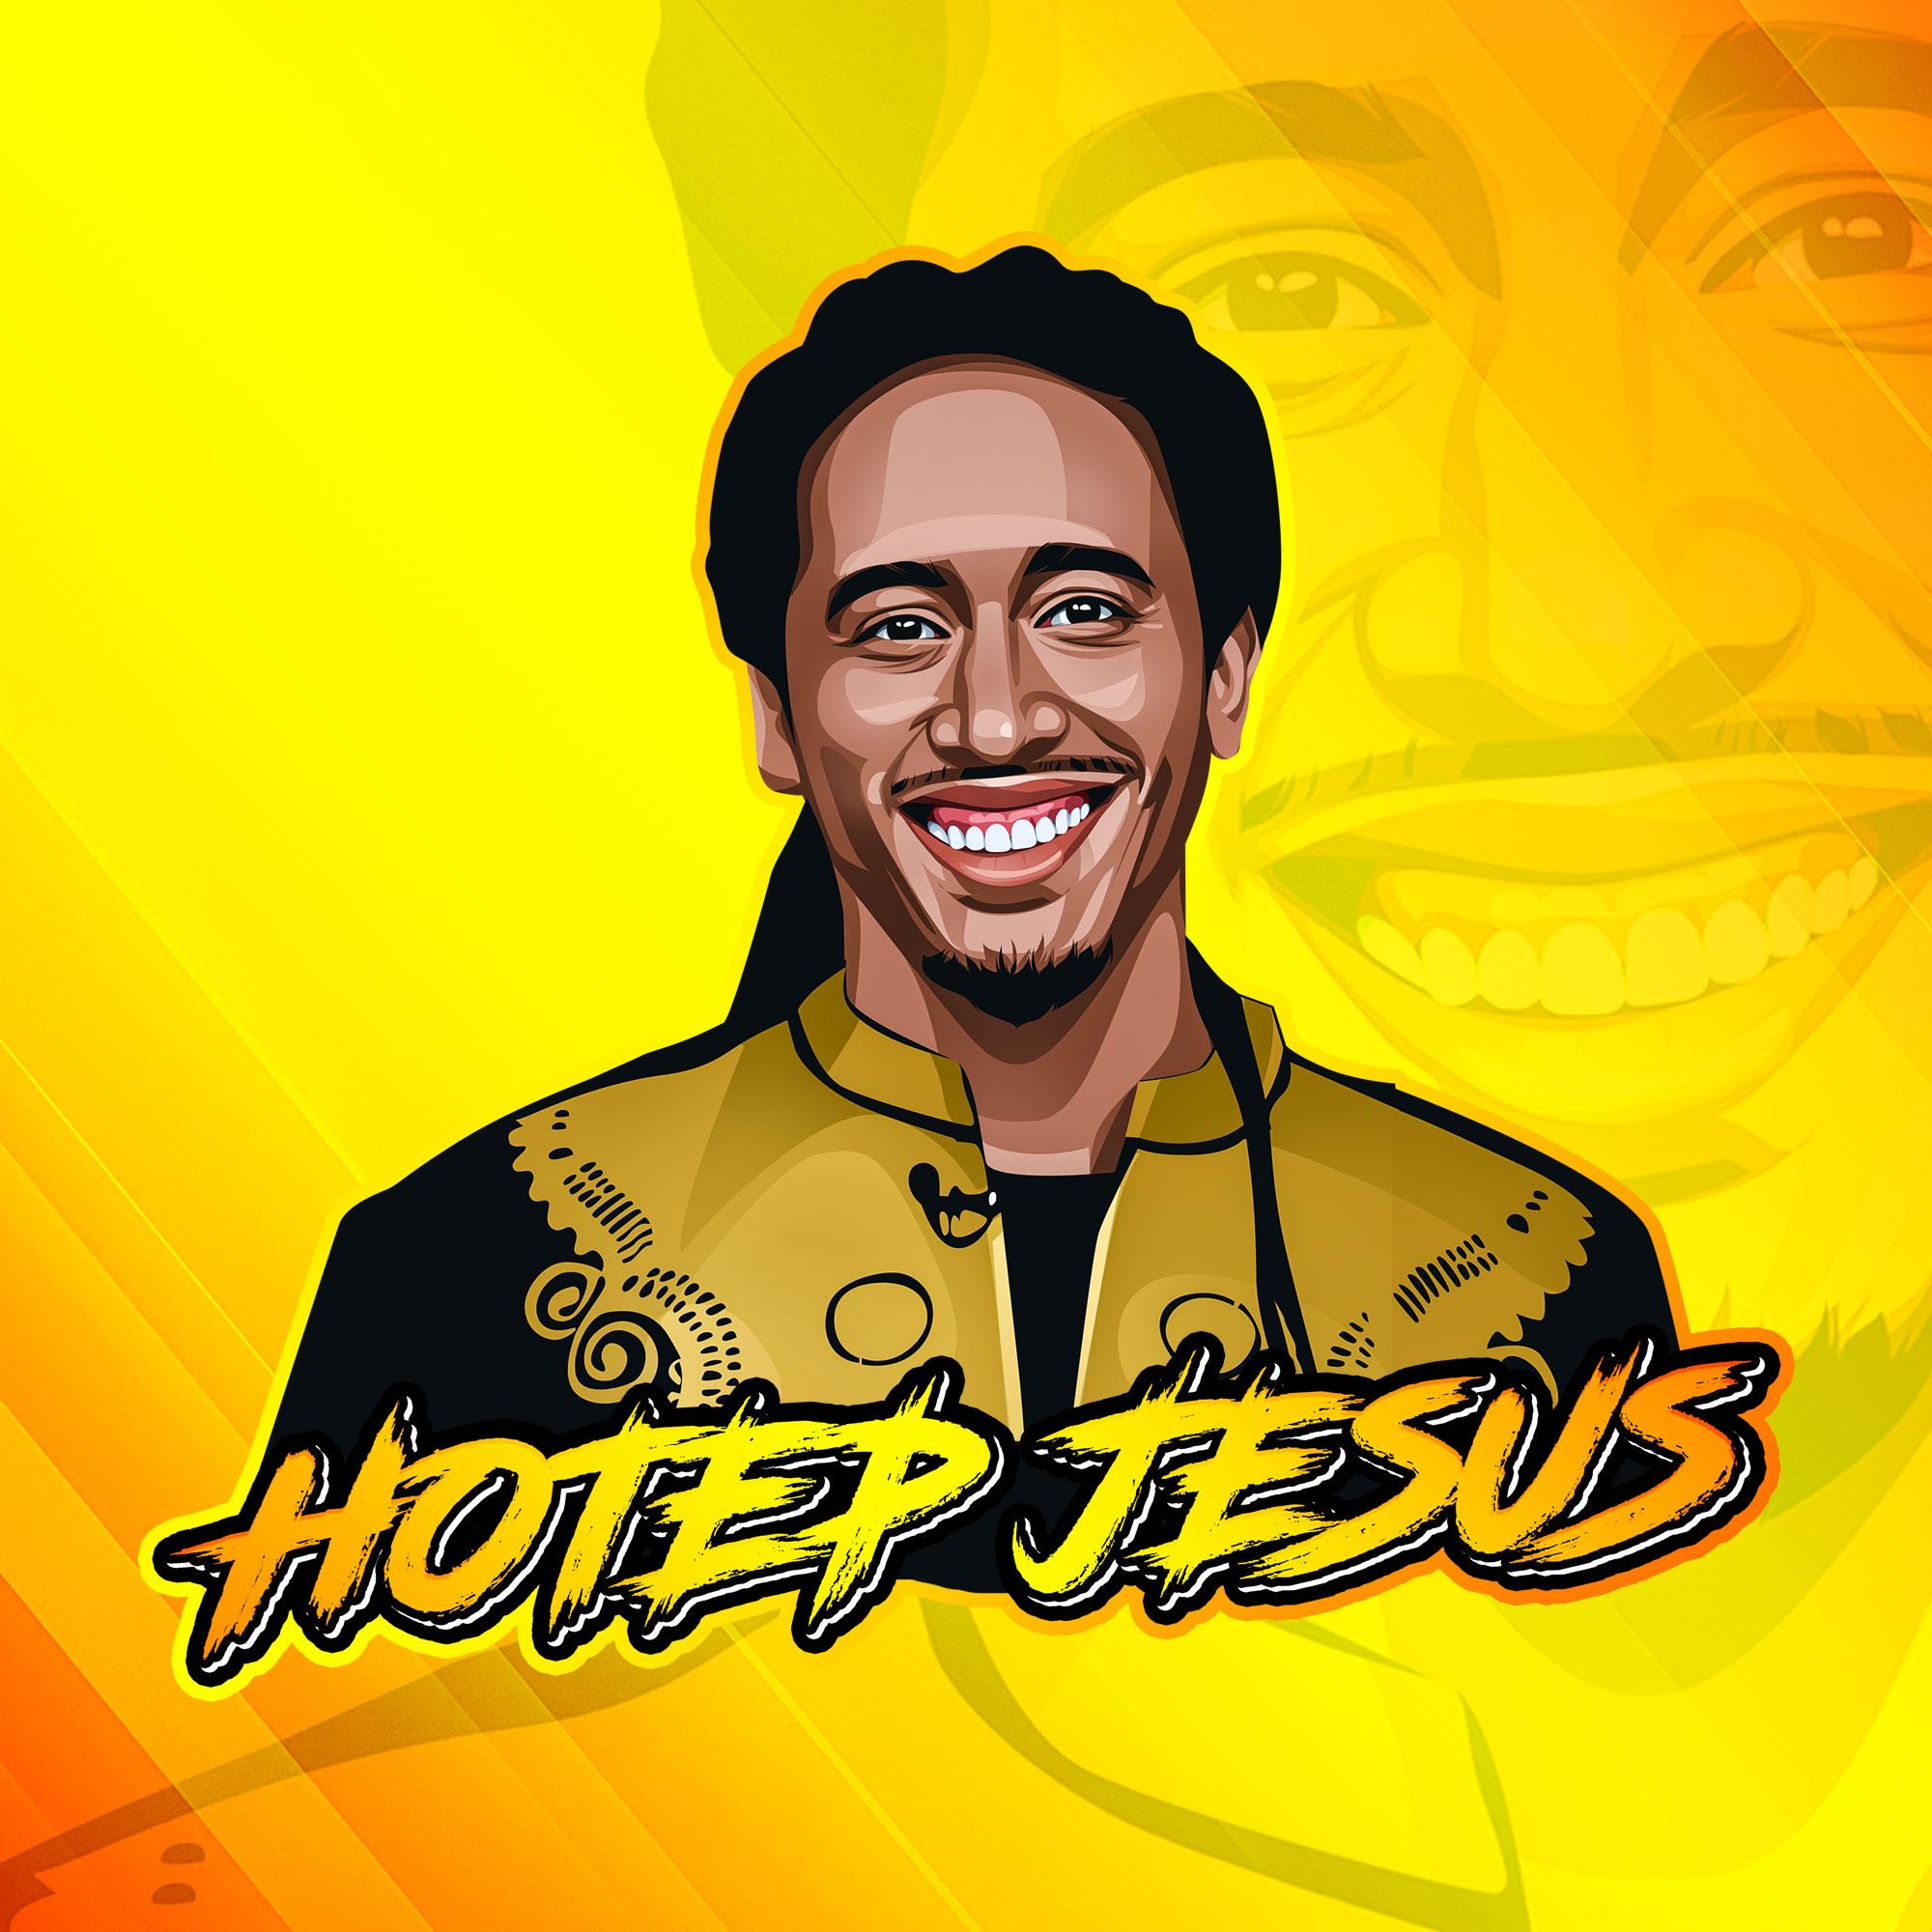 Sharpe Conversations with Hotep Jesus Image